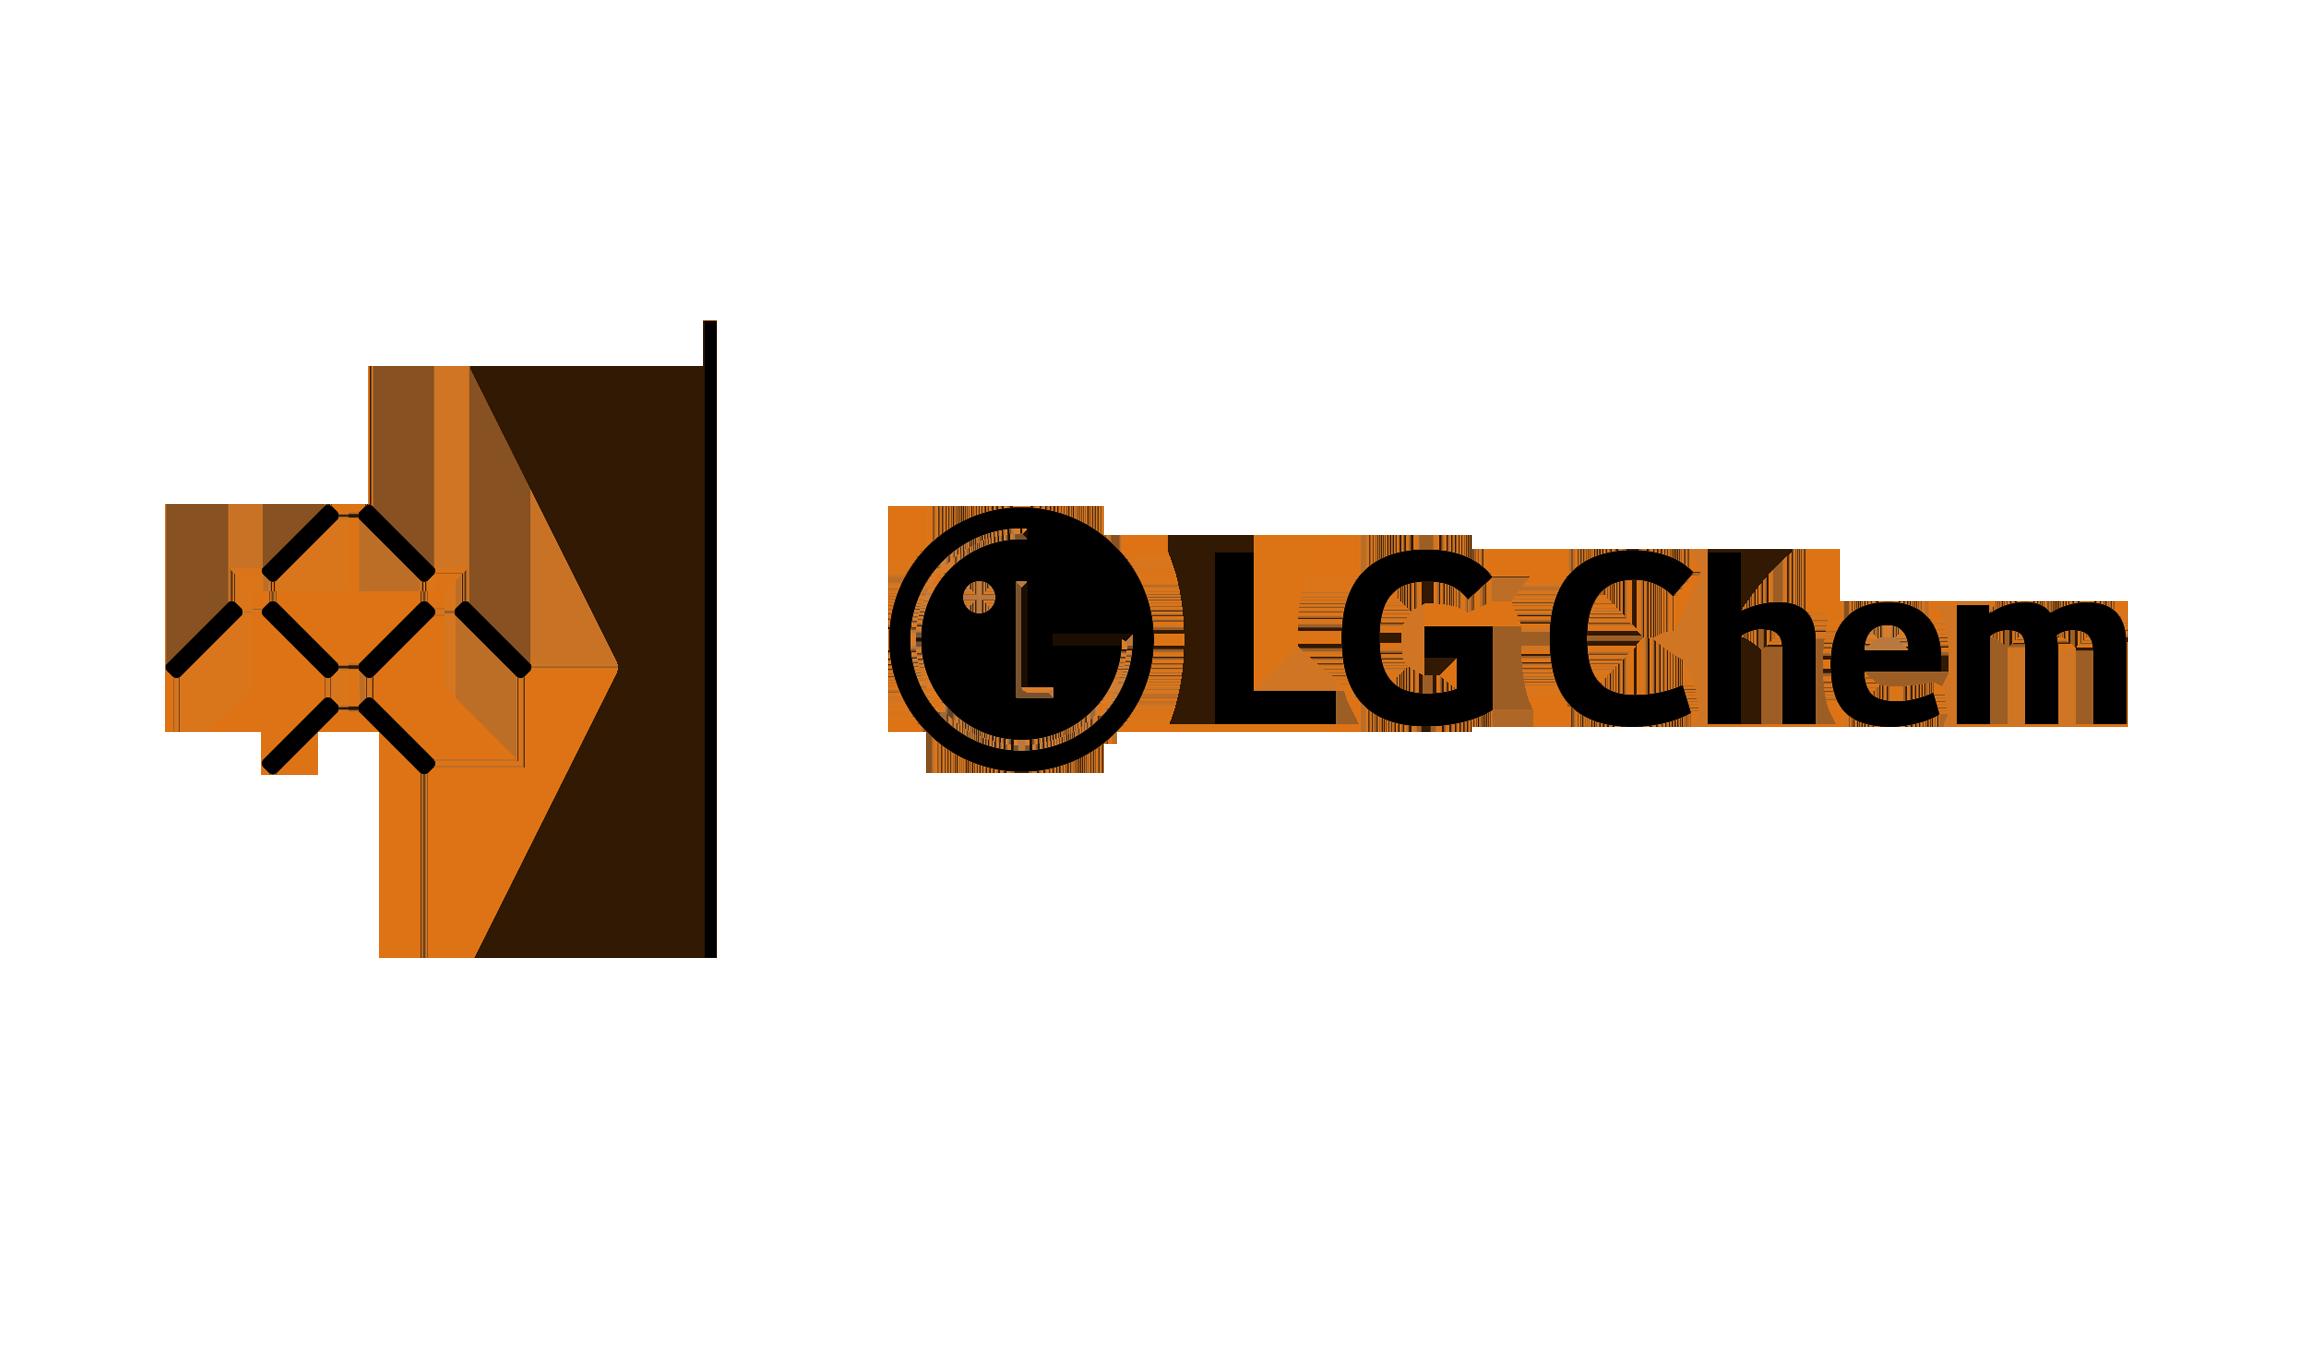 faraday-future-lg-chem-logo